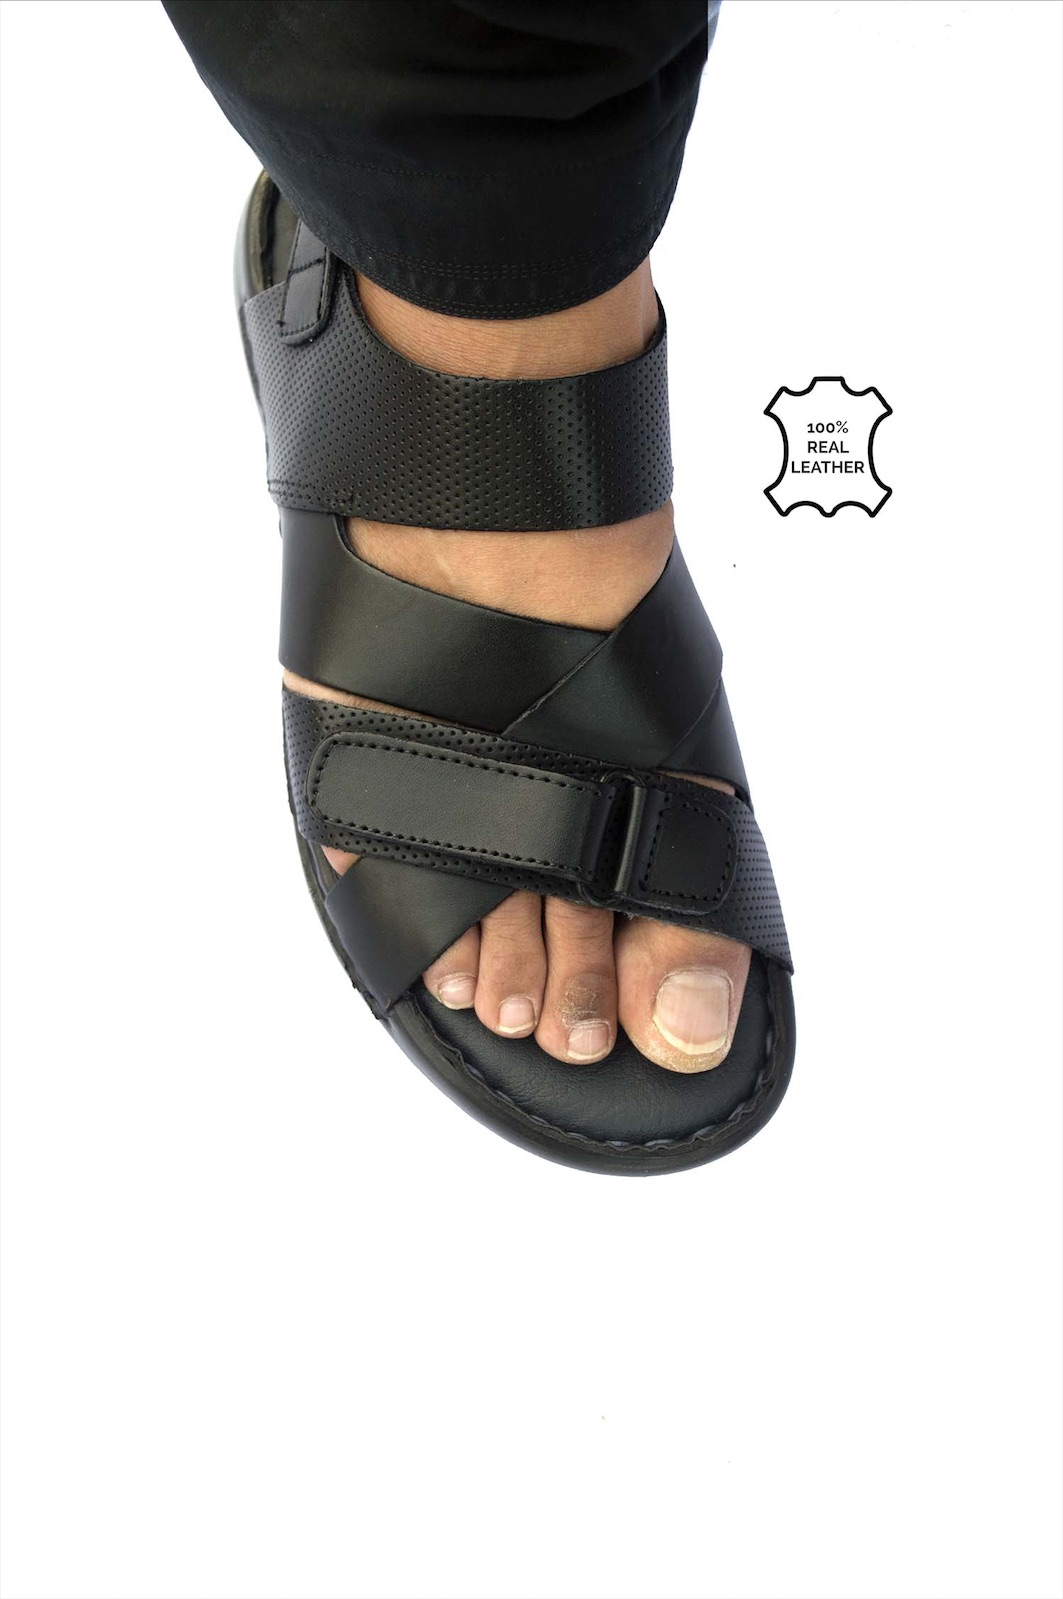 100% Pure Leather Sandal For Men - Color Black